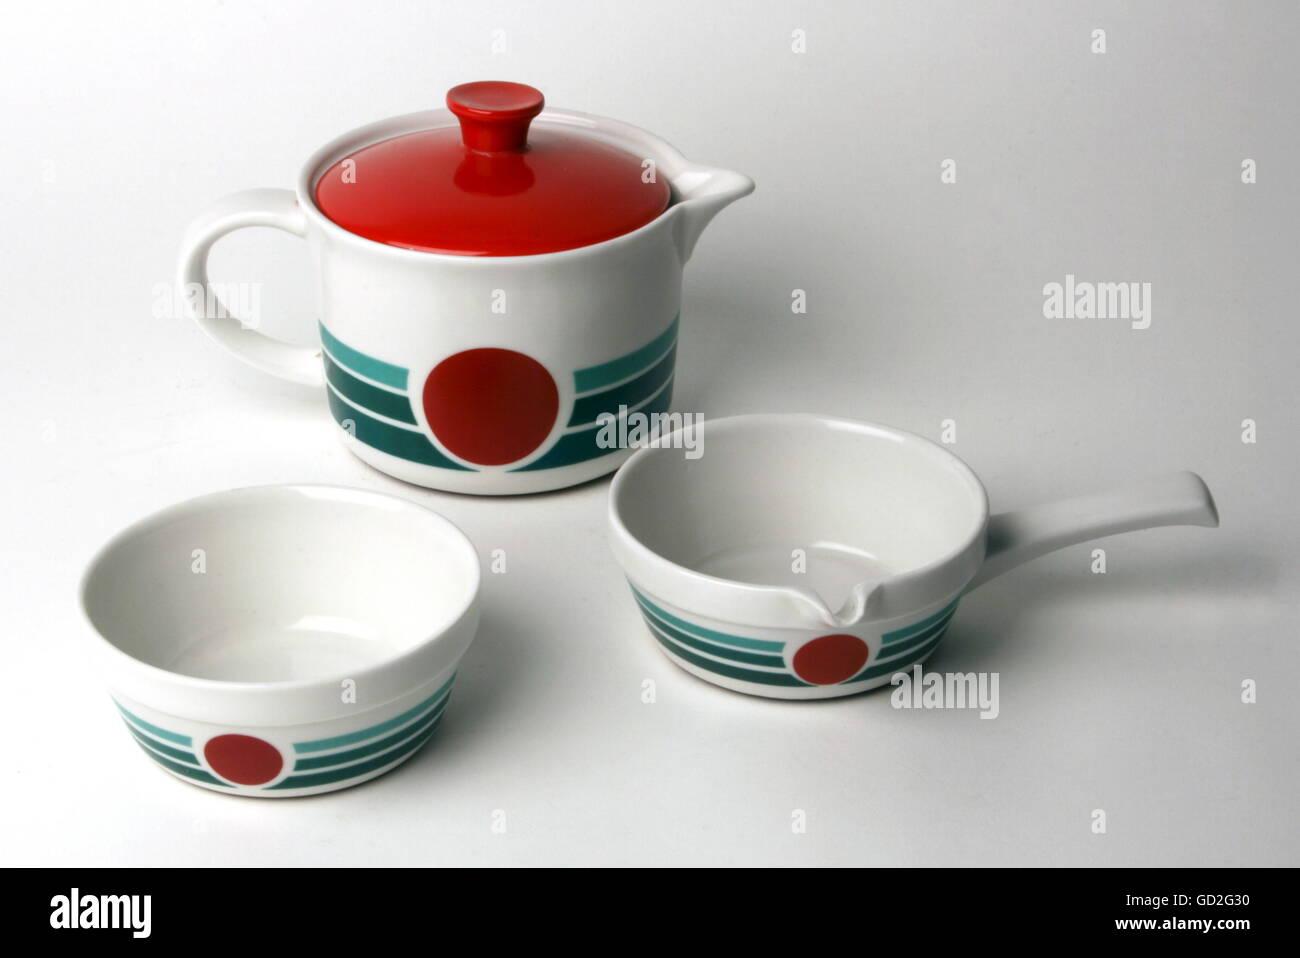 household, kitchen, boil-proof porcelain dish 'Cordoflam', design: Hans Merz (Form), decor variants of the - Stock Image